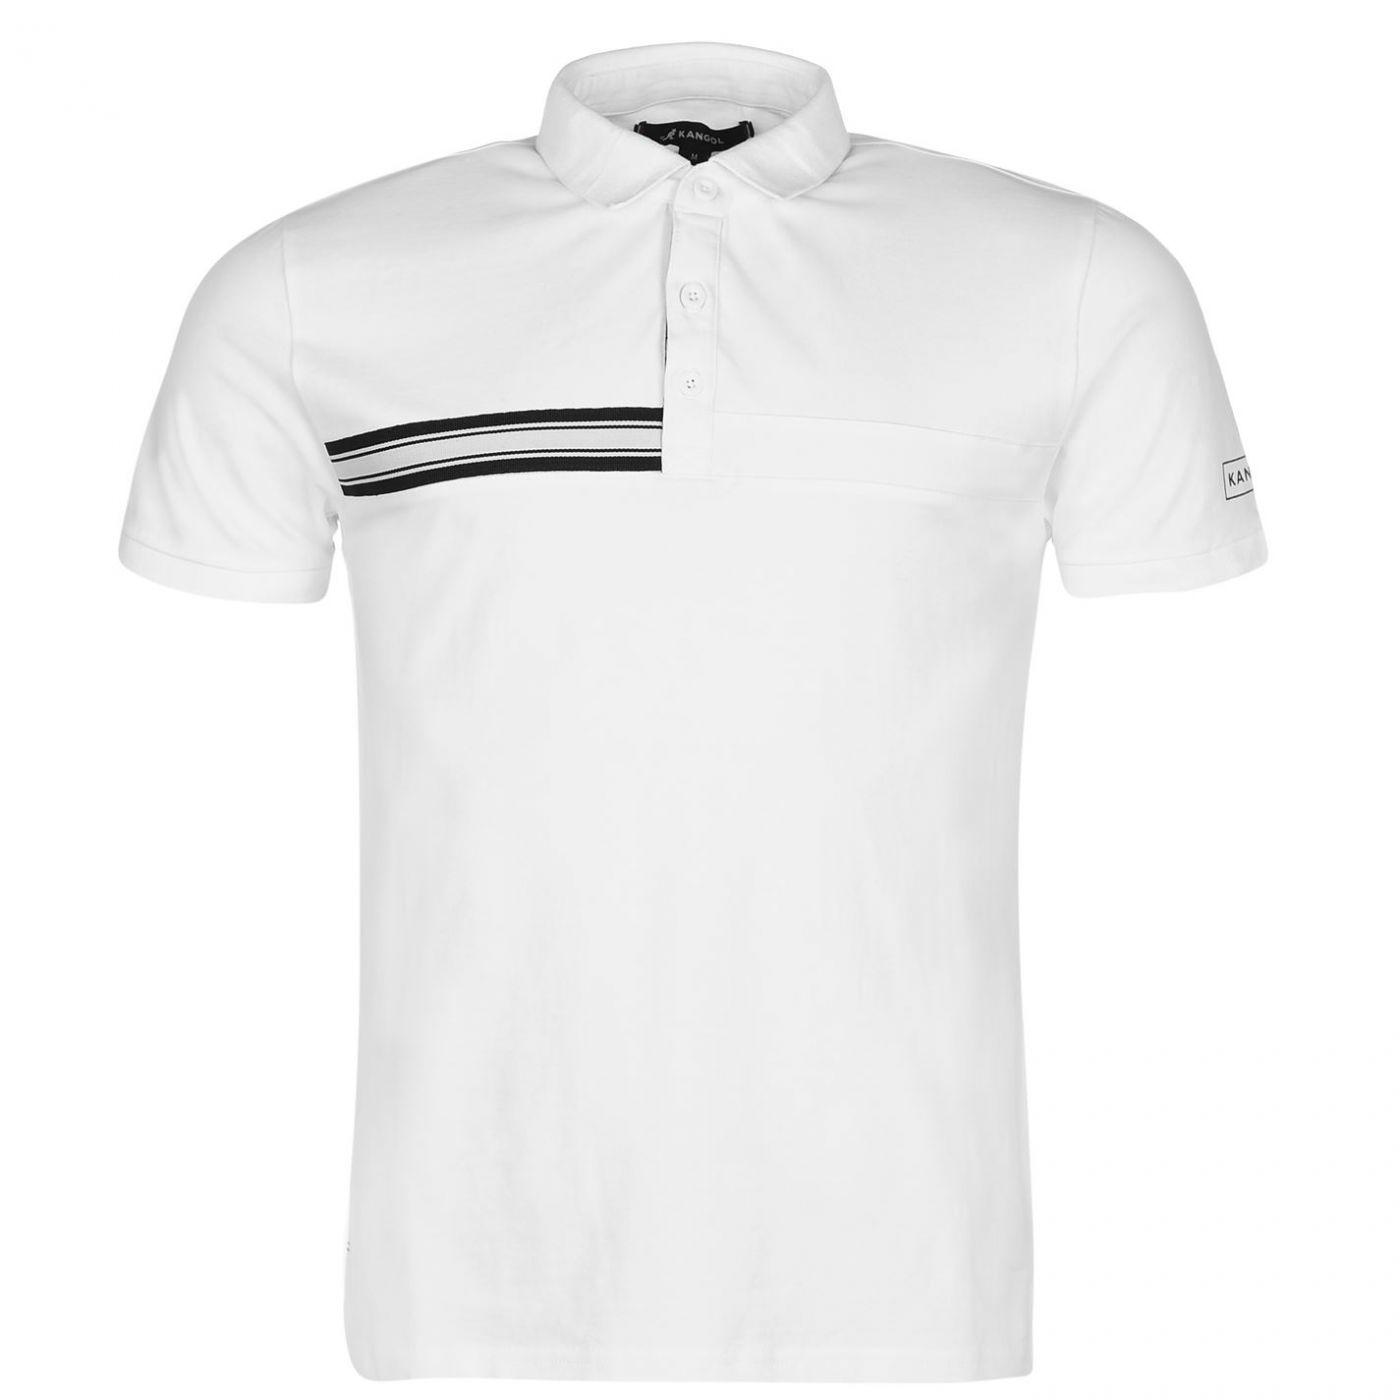 bb79ddebc3d1 Kangol Taped Polo Shirt Mens - FACTCOOL